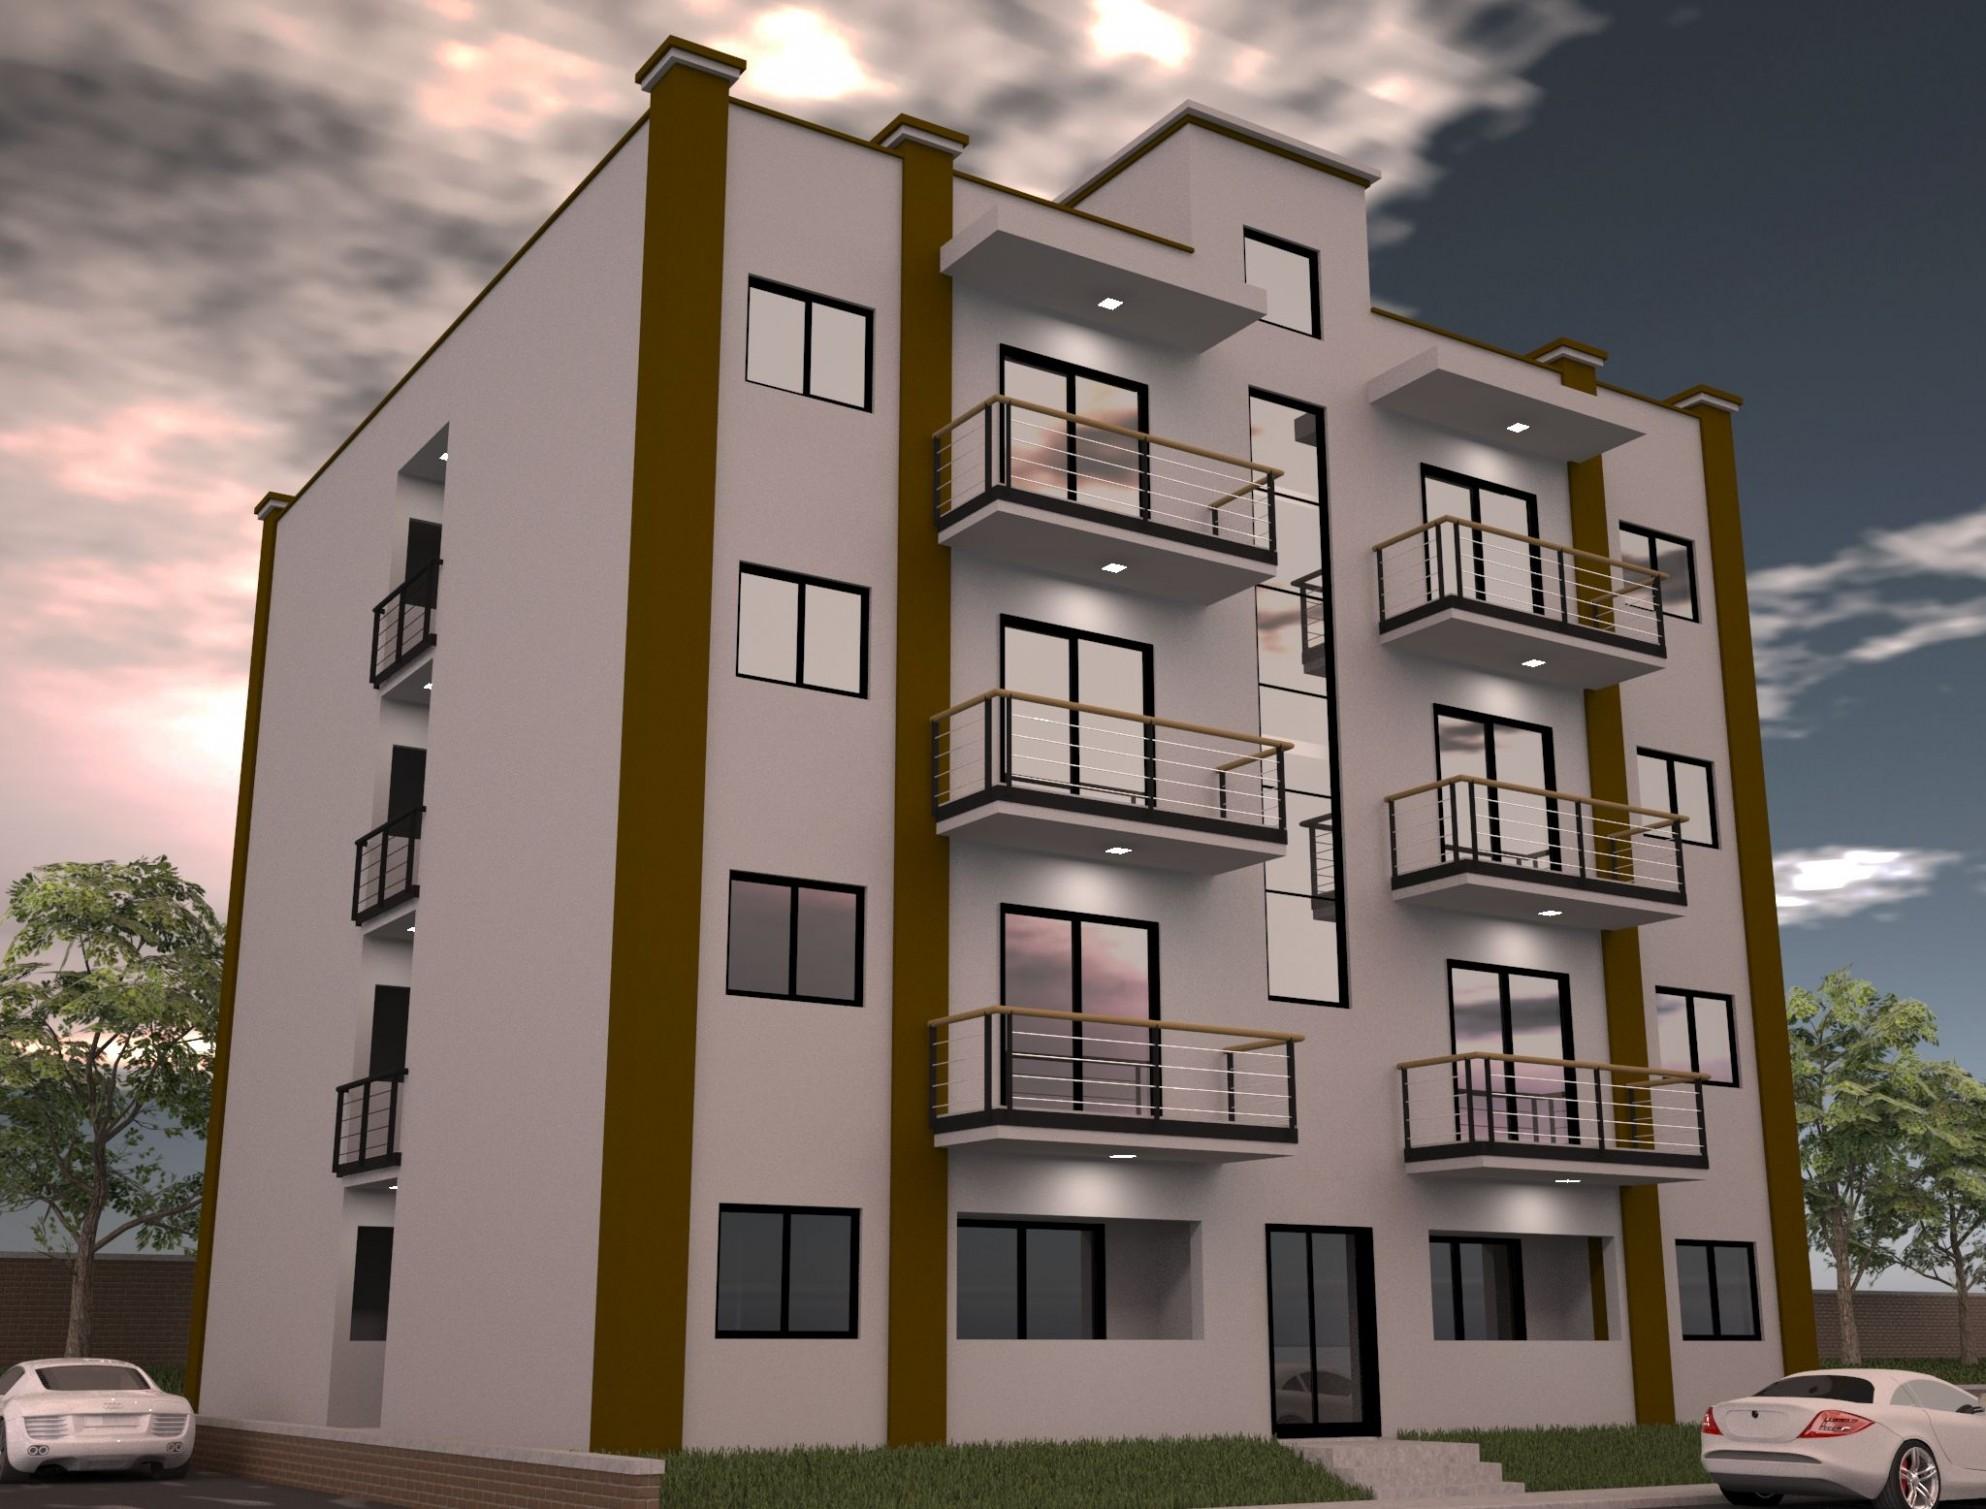 house-apartment-exterior-design-ideas-waplag-building_exterior  - Apartment Exterior Design Ideas